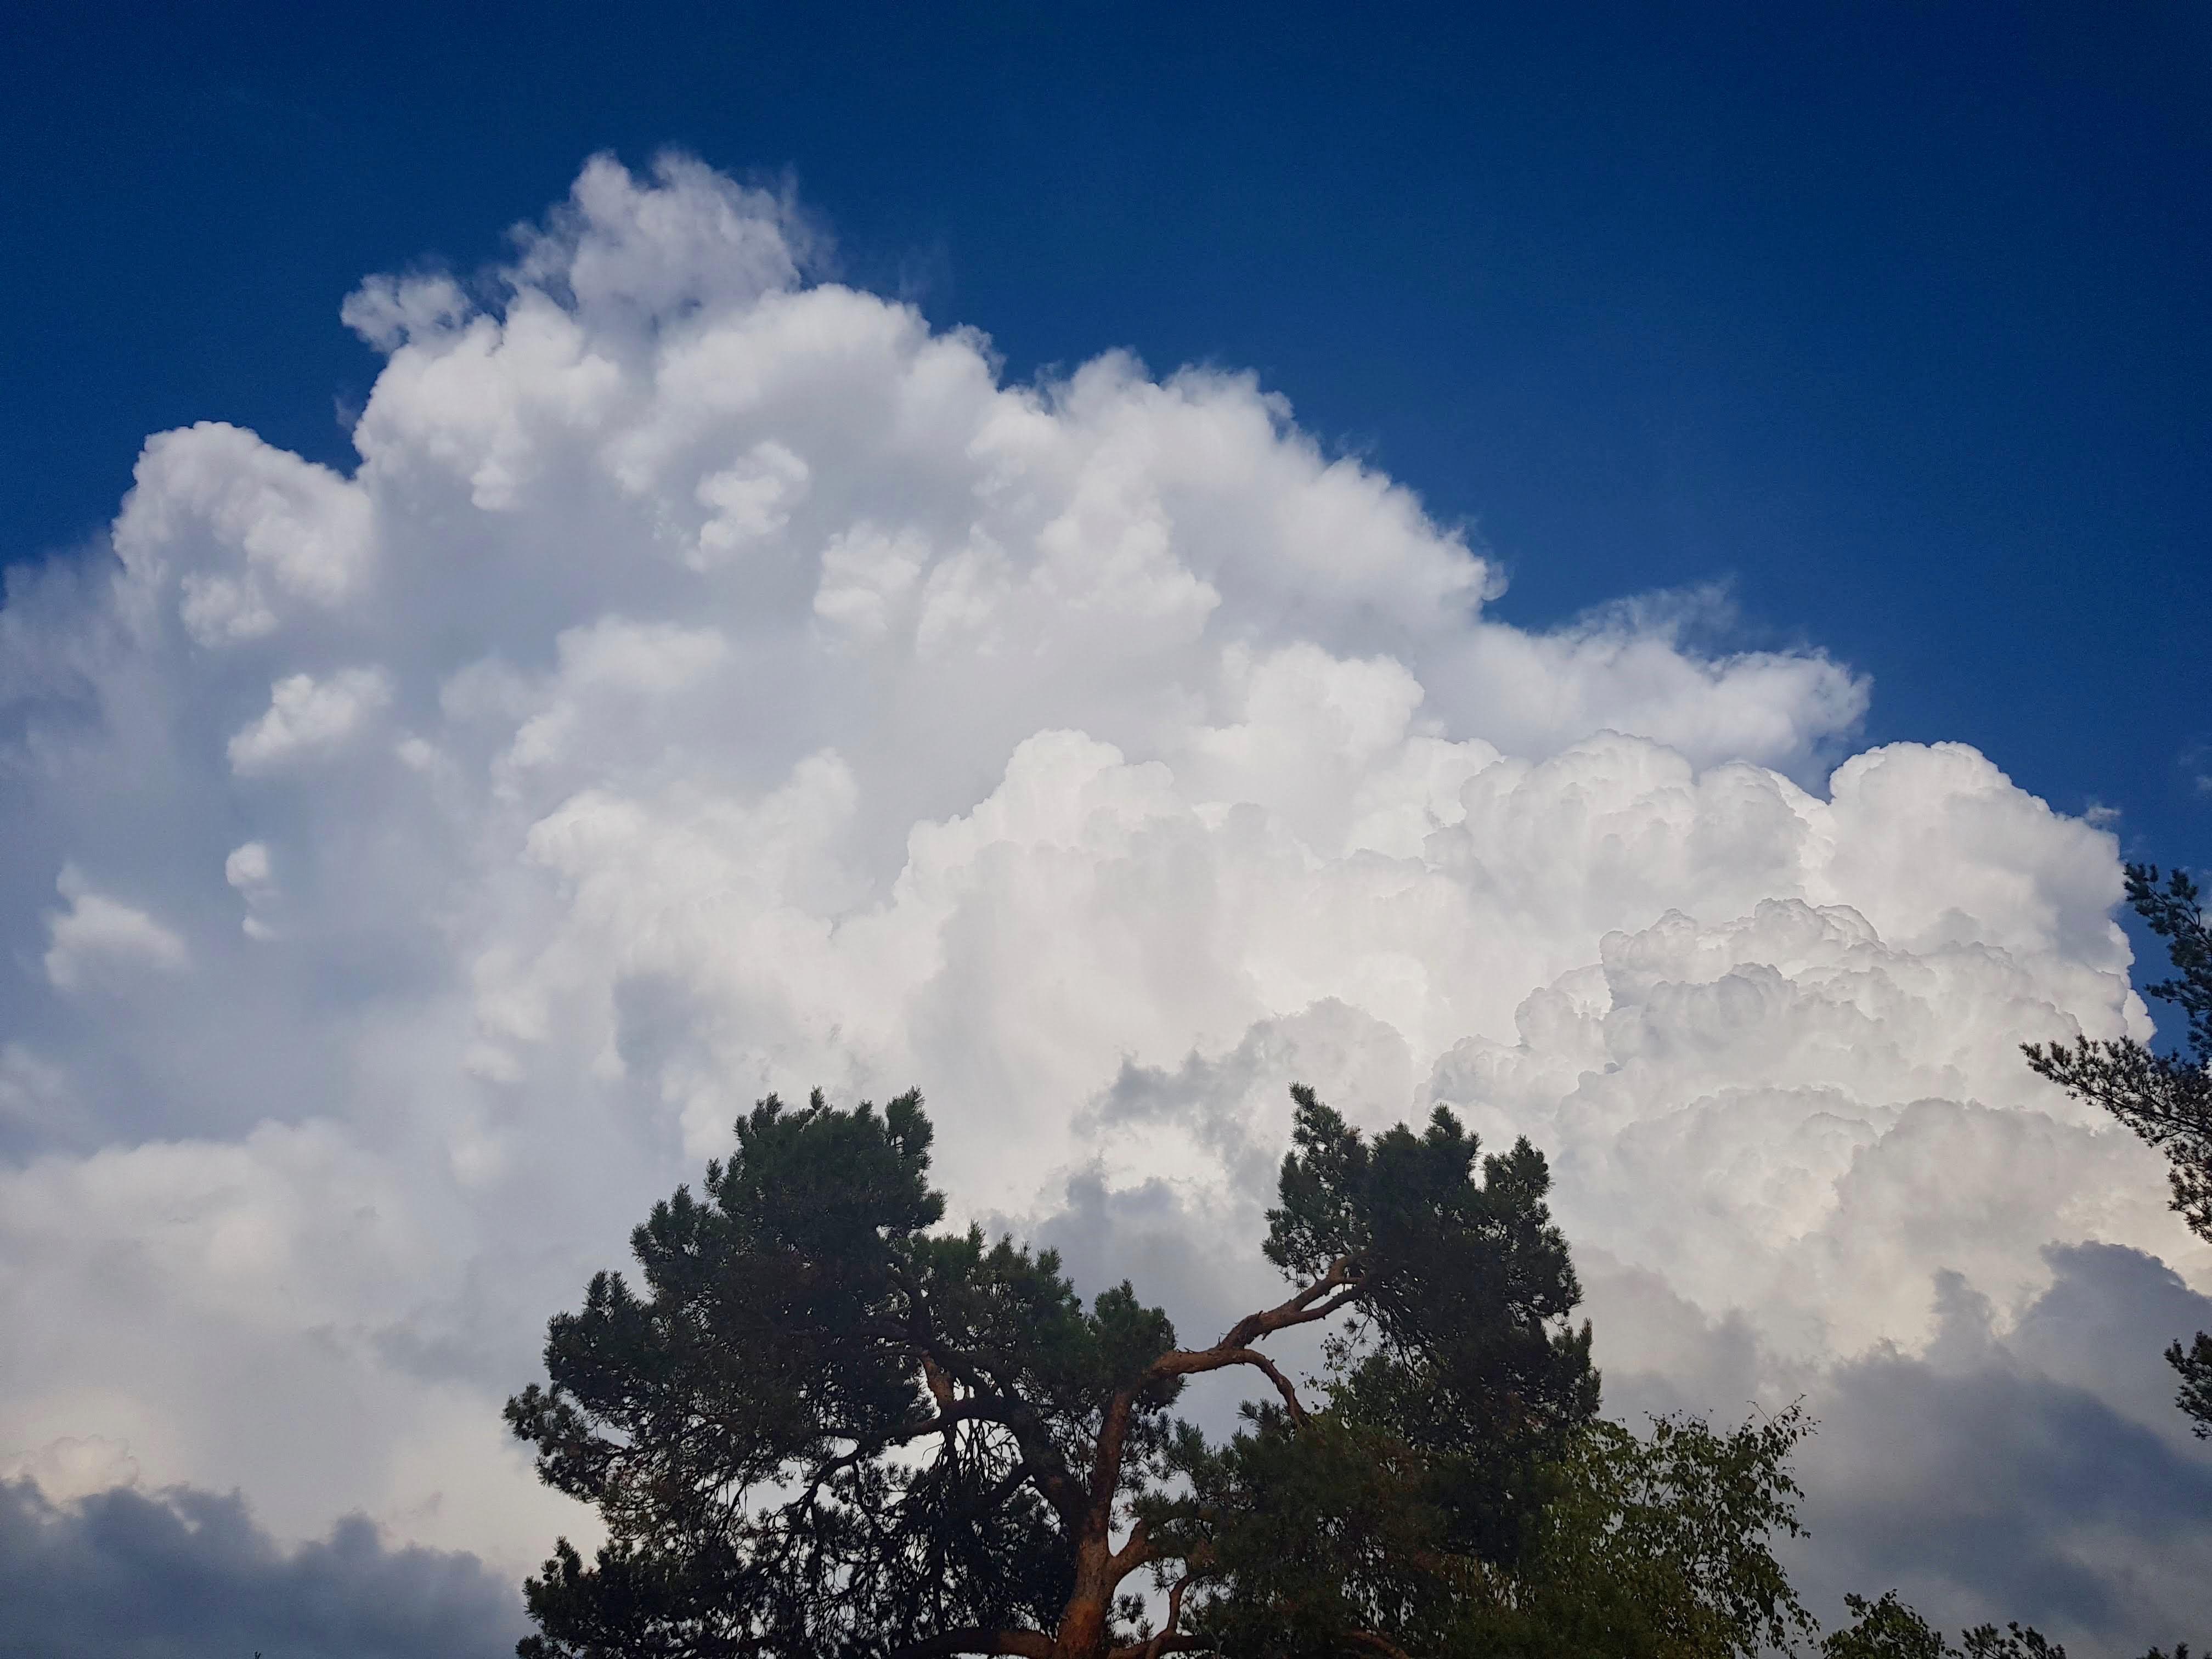 Cloud by Ingemar Pongratz